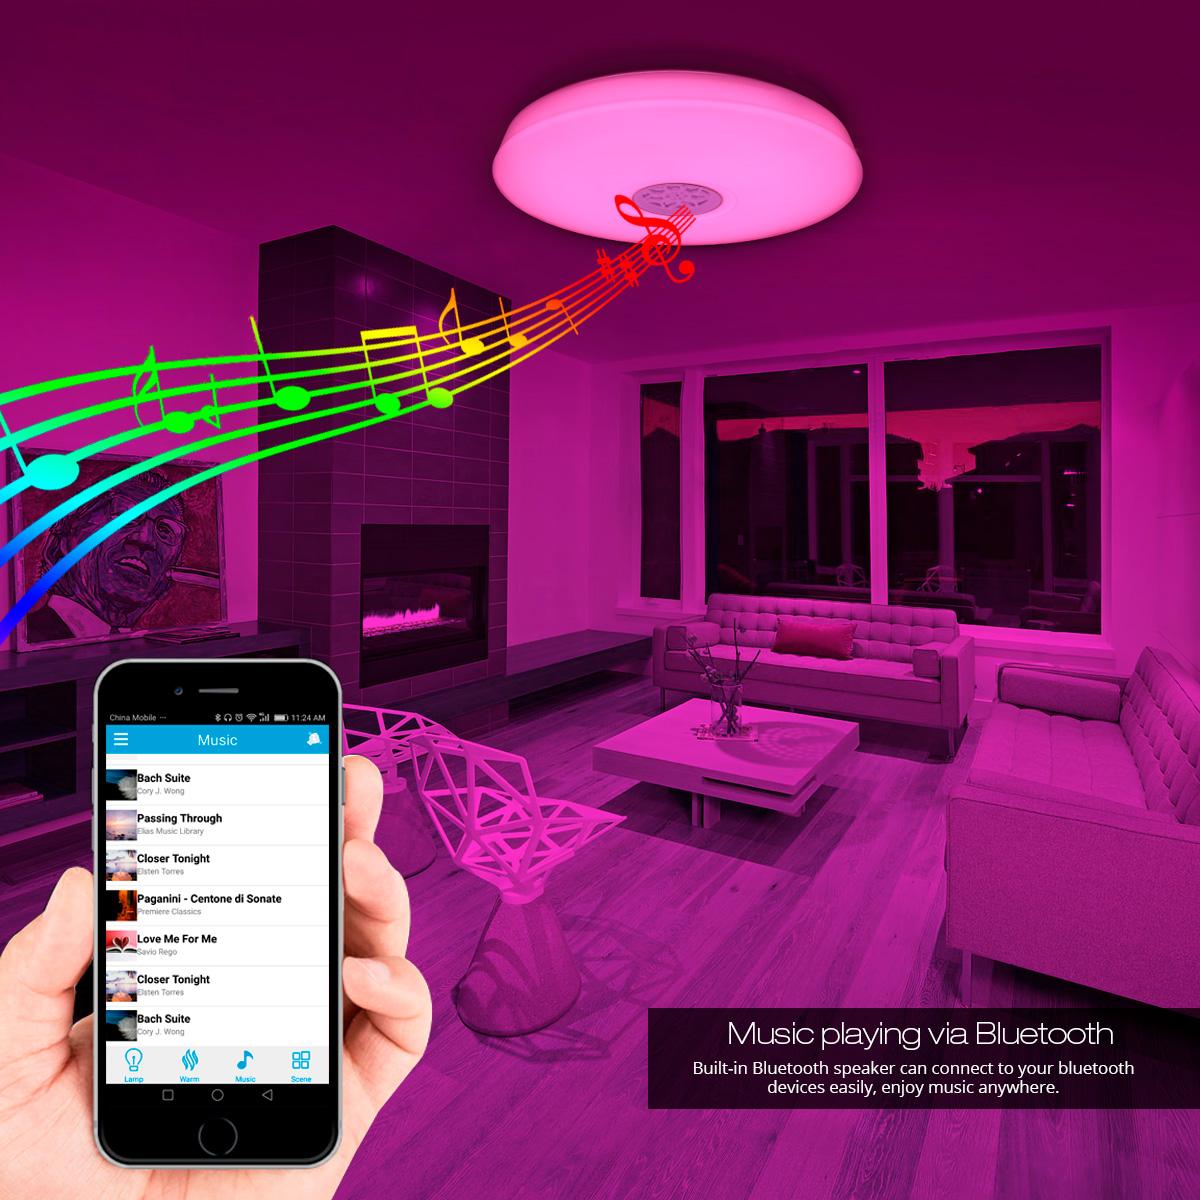 le dimmbar 24w led deckenlampe mit bluetooth lautsprecher. Black Bedroom Furniture Sets. Home Design Ideas